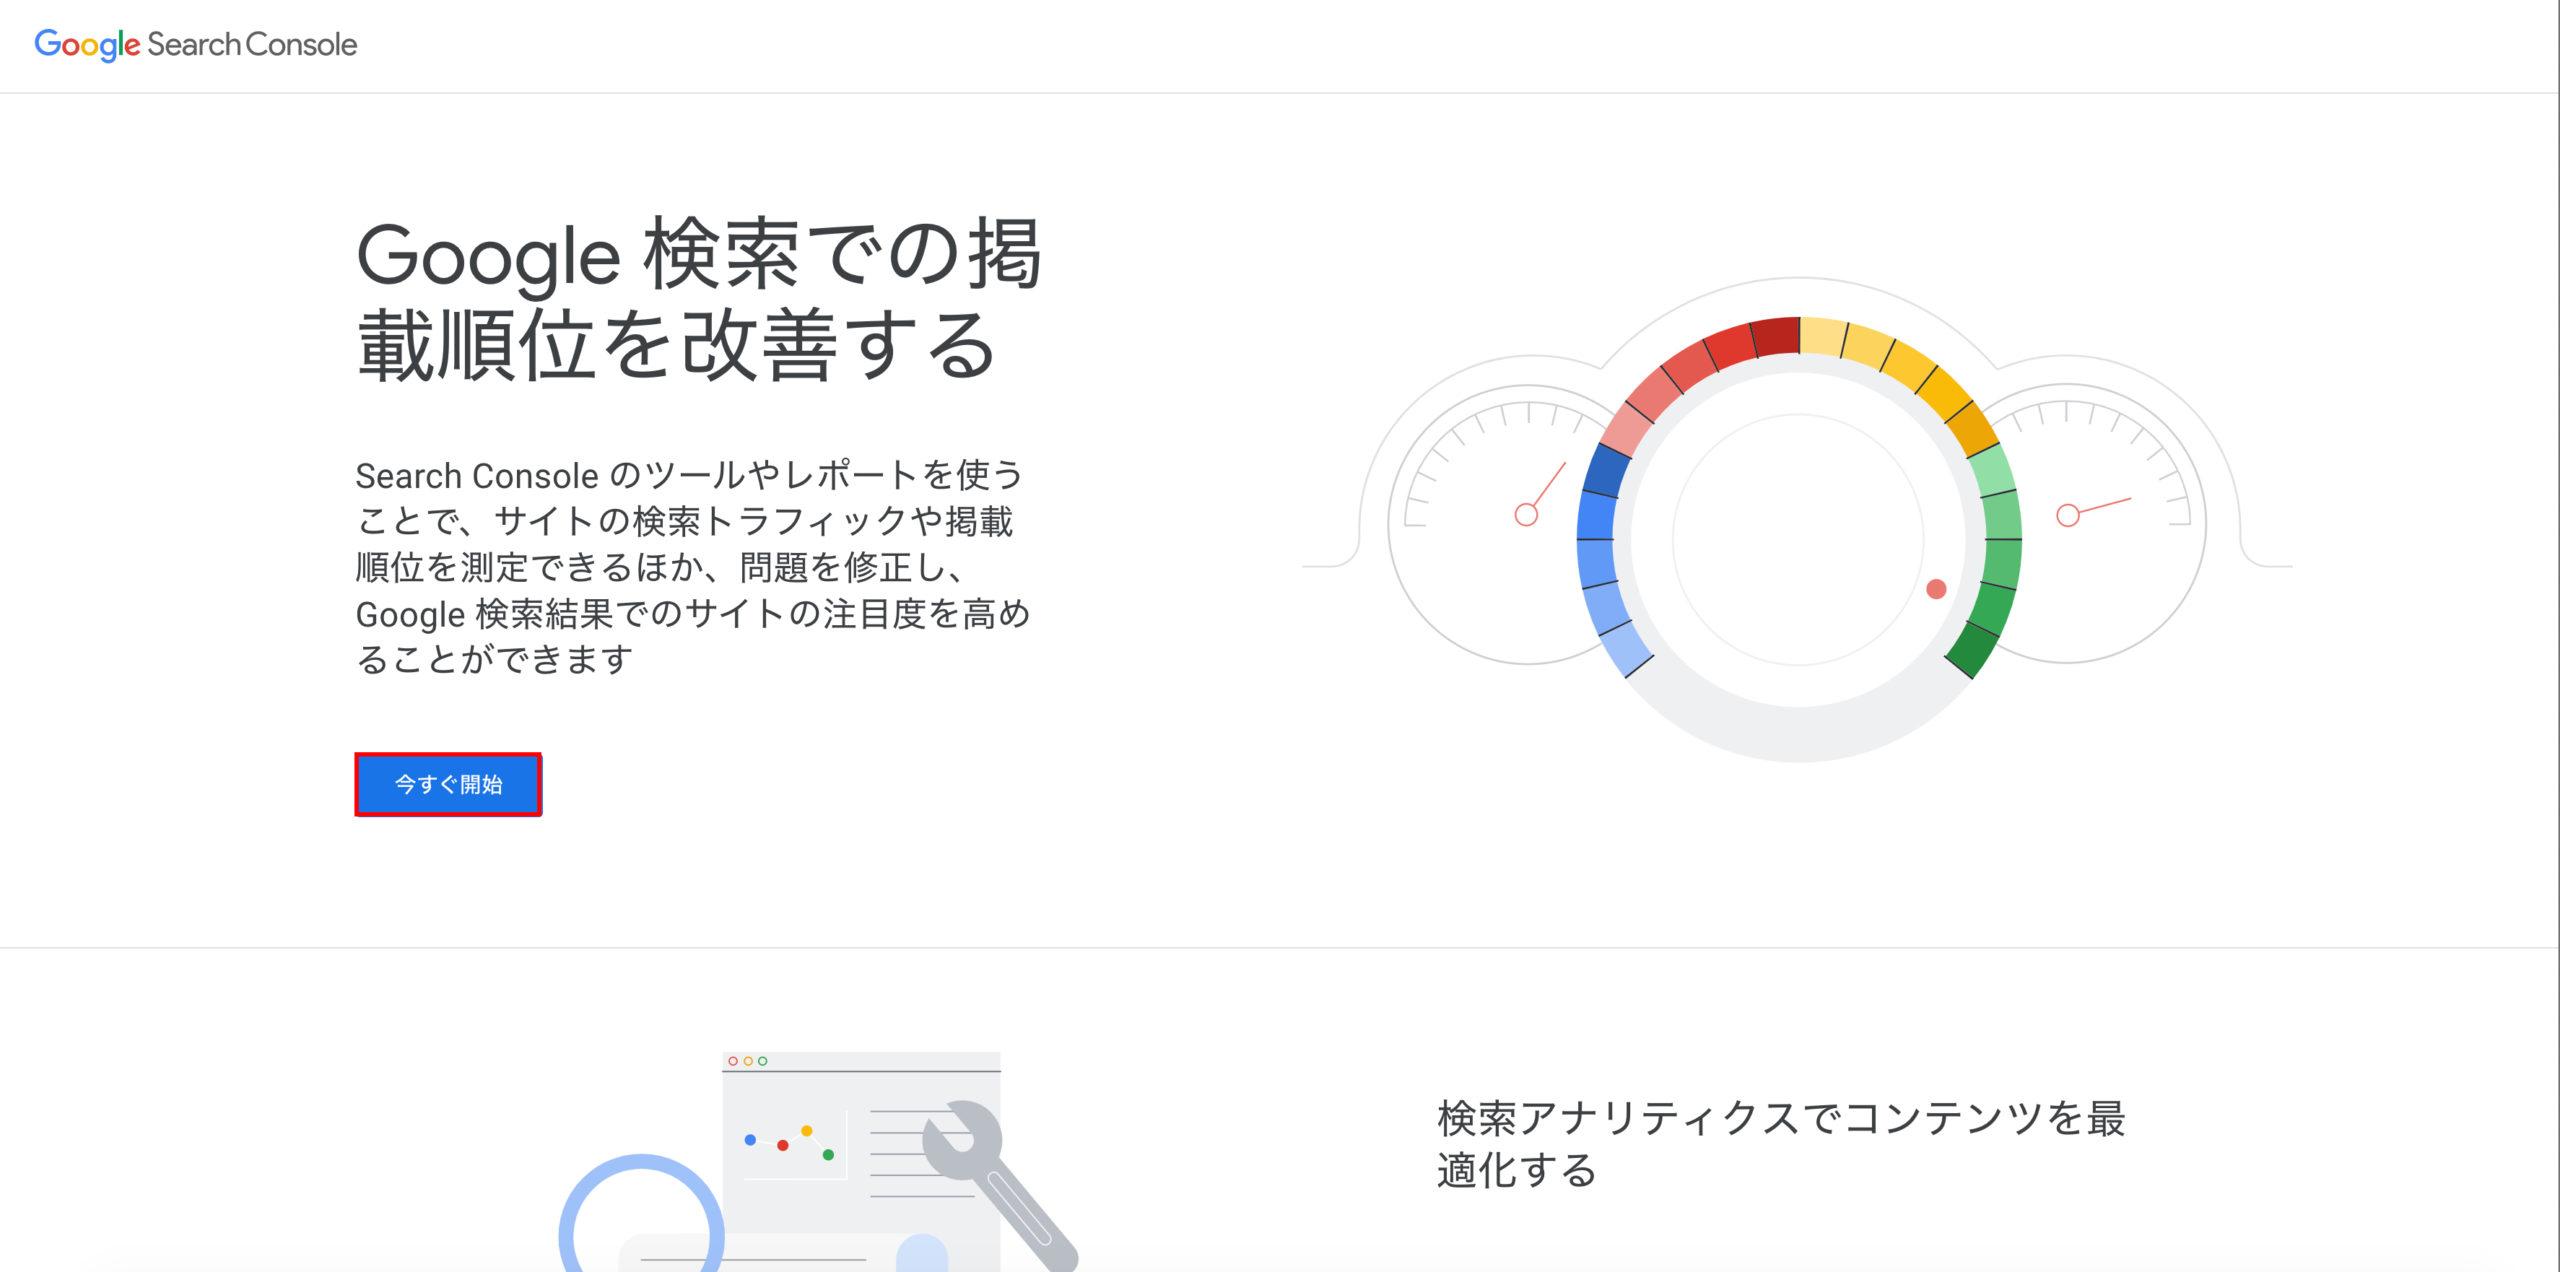 Google Search Consoleのトップページ